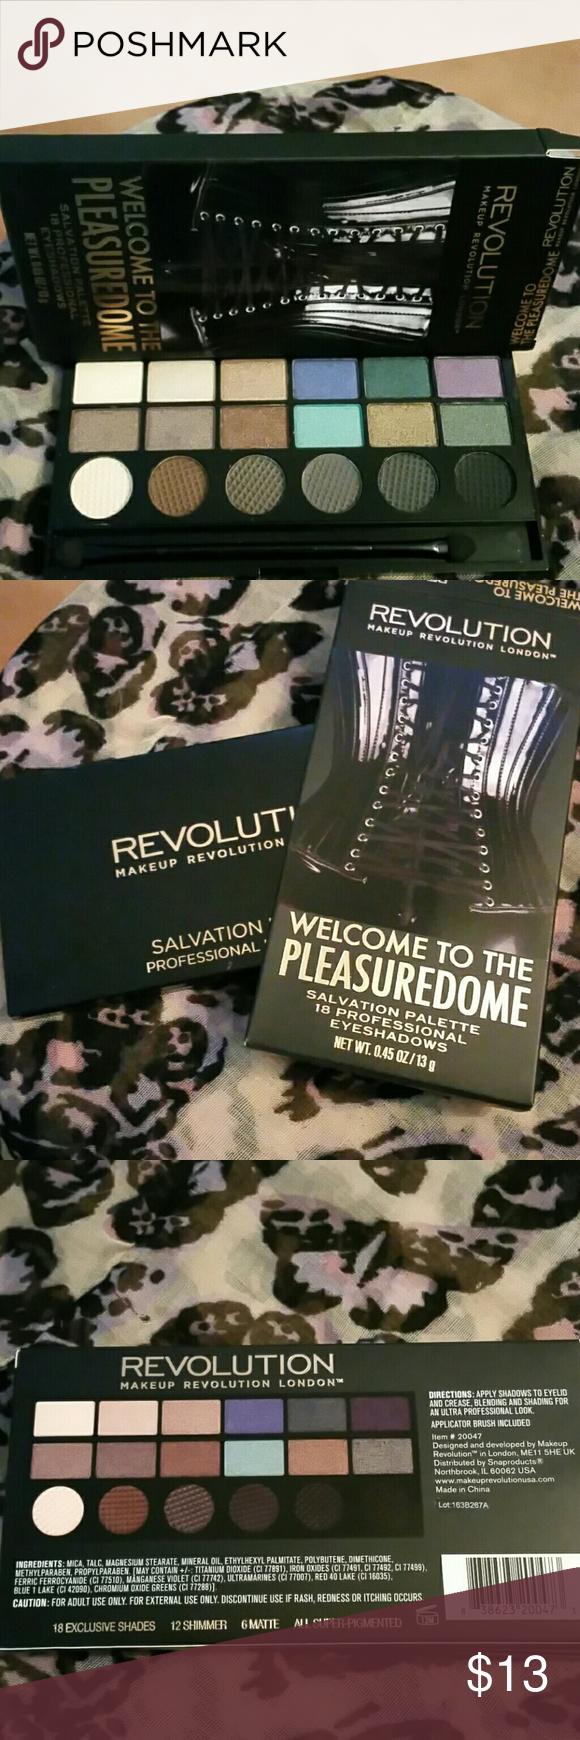 HoldSalvation palette nib, pleasuredome revolution